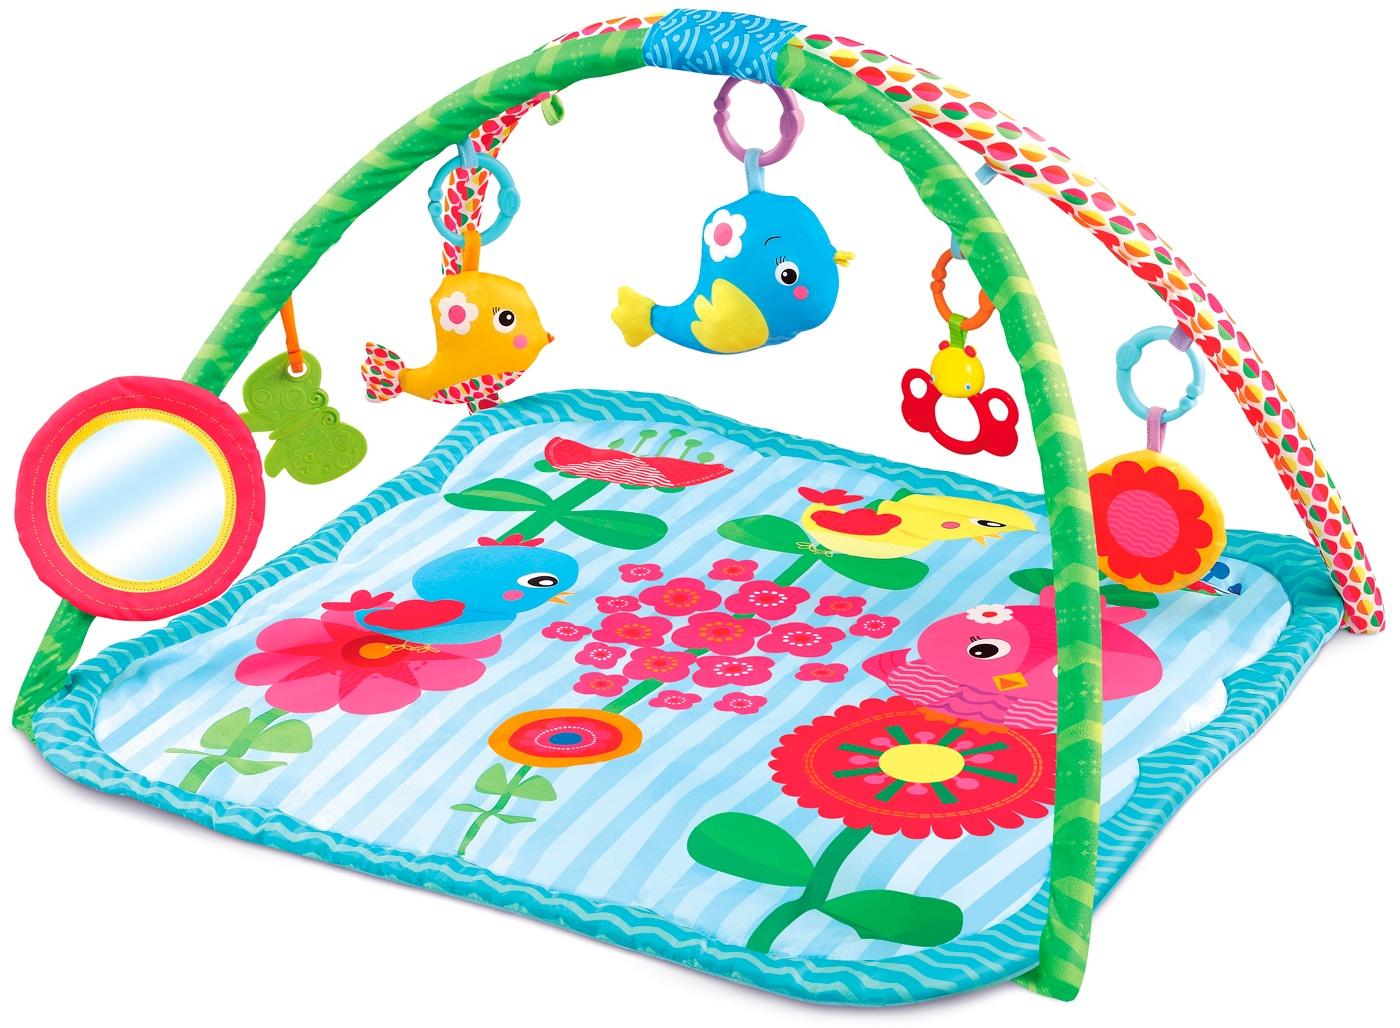 Развивающий коврик картинки для детей